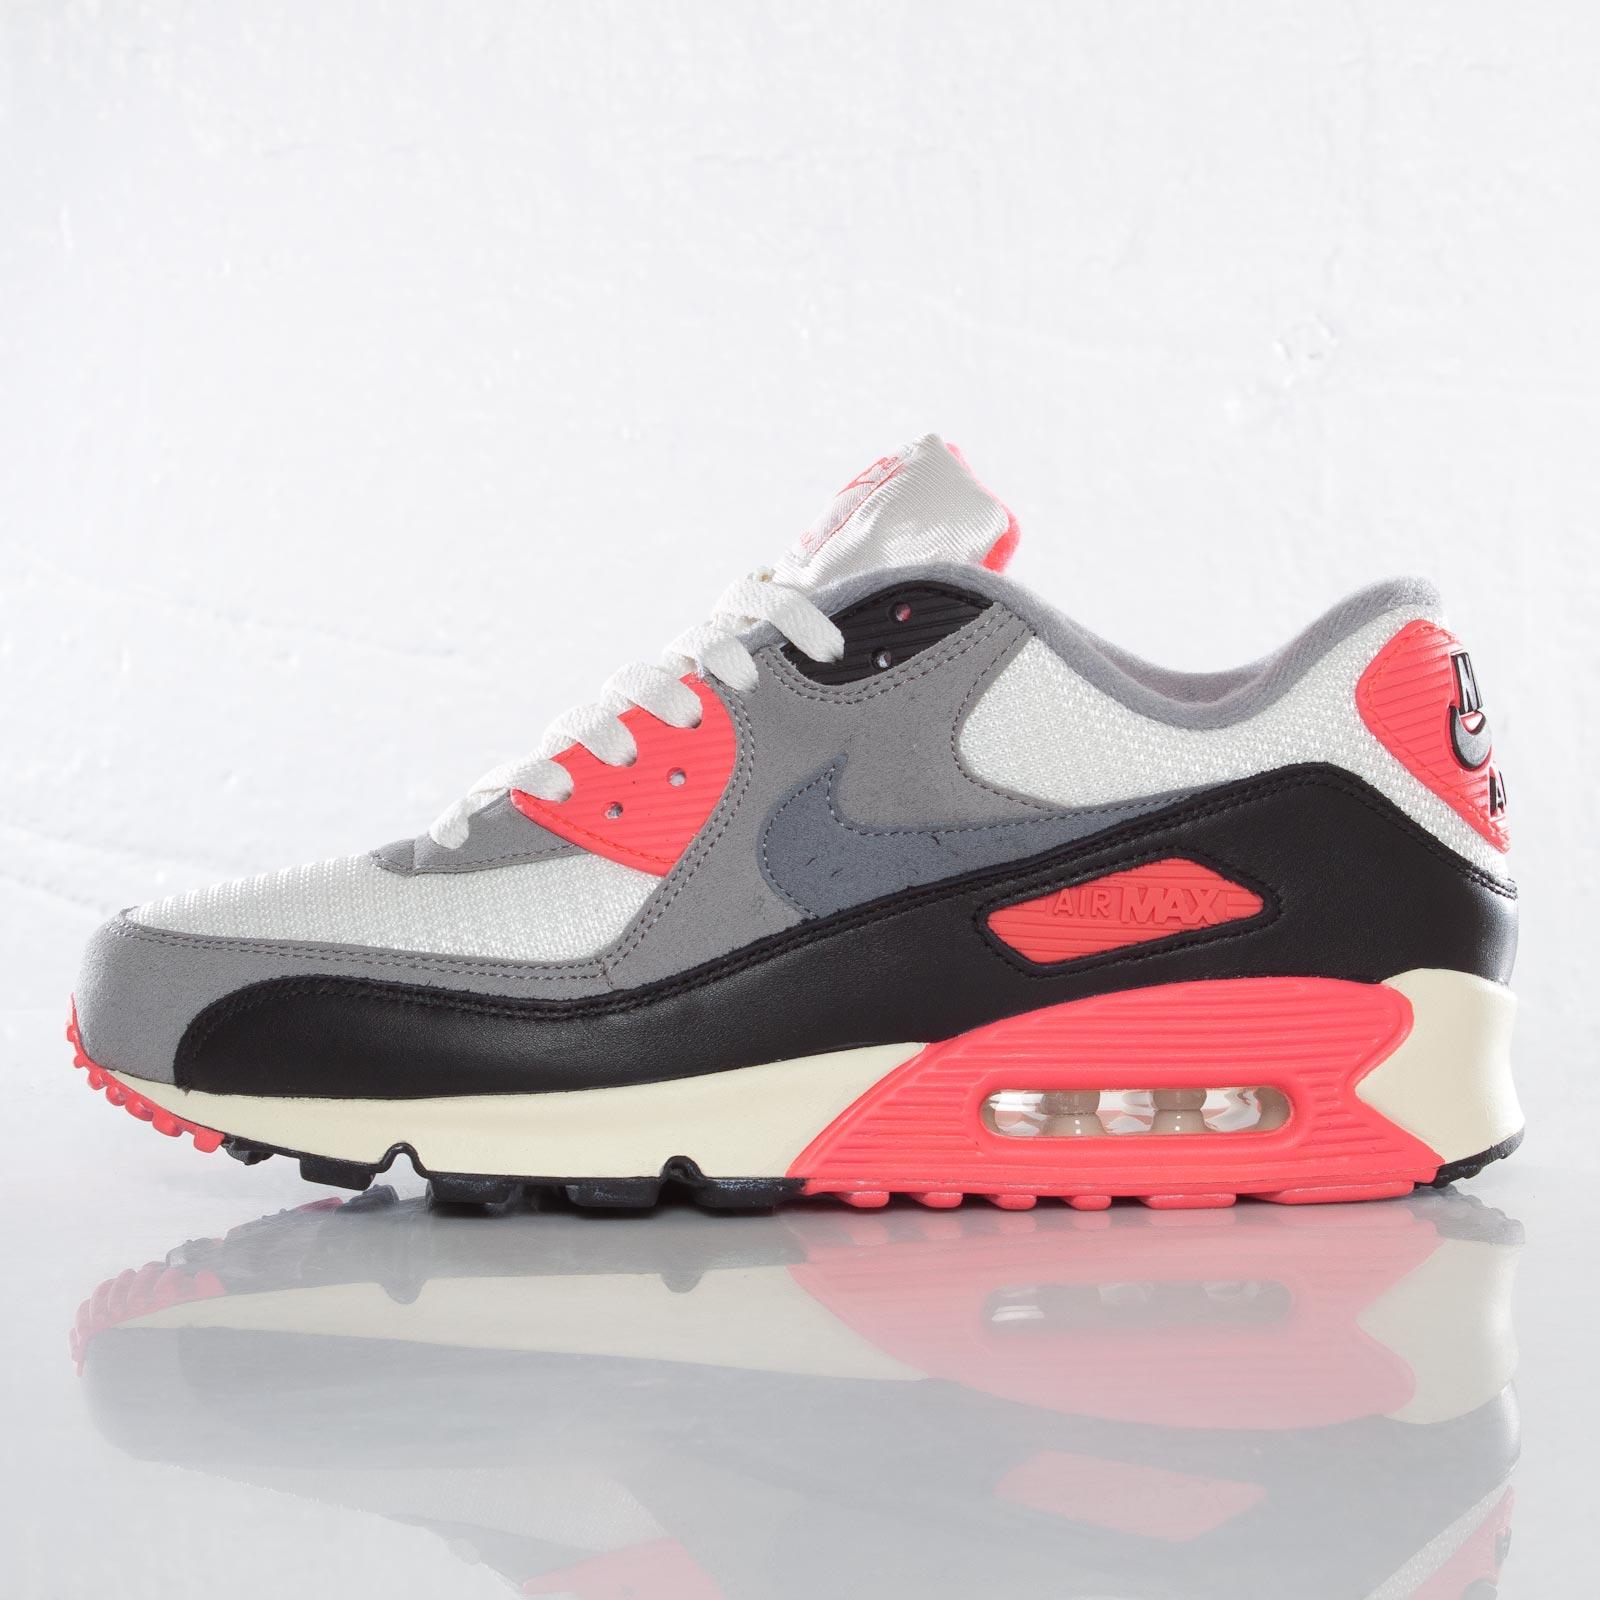 innovative design 9baa2 3b346 ... Nike Air Max 90 OG ...